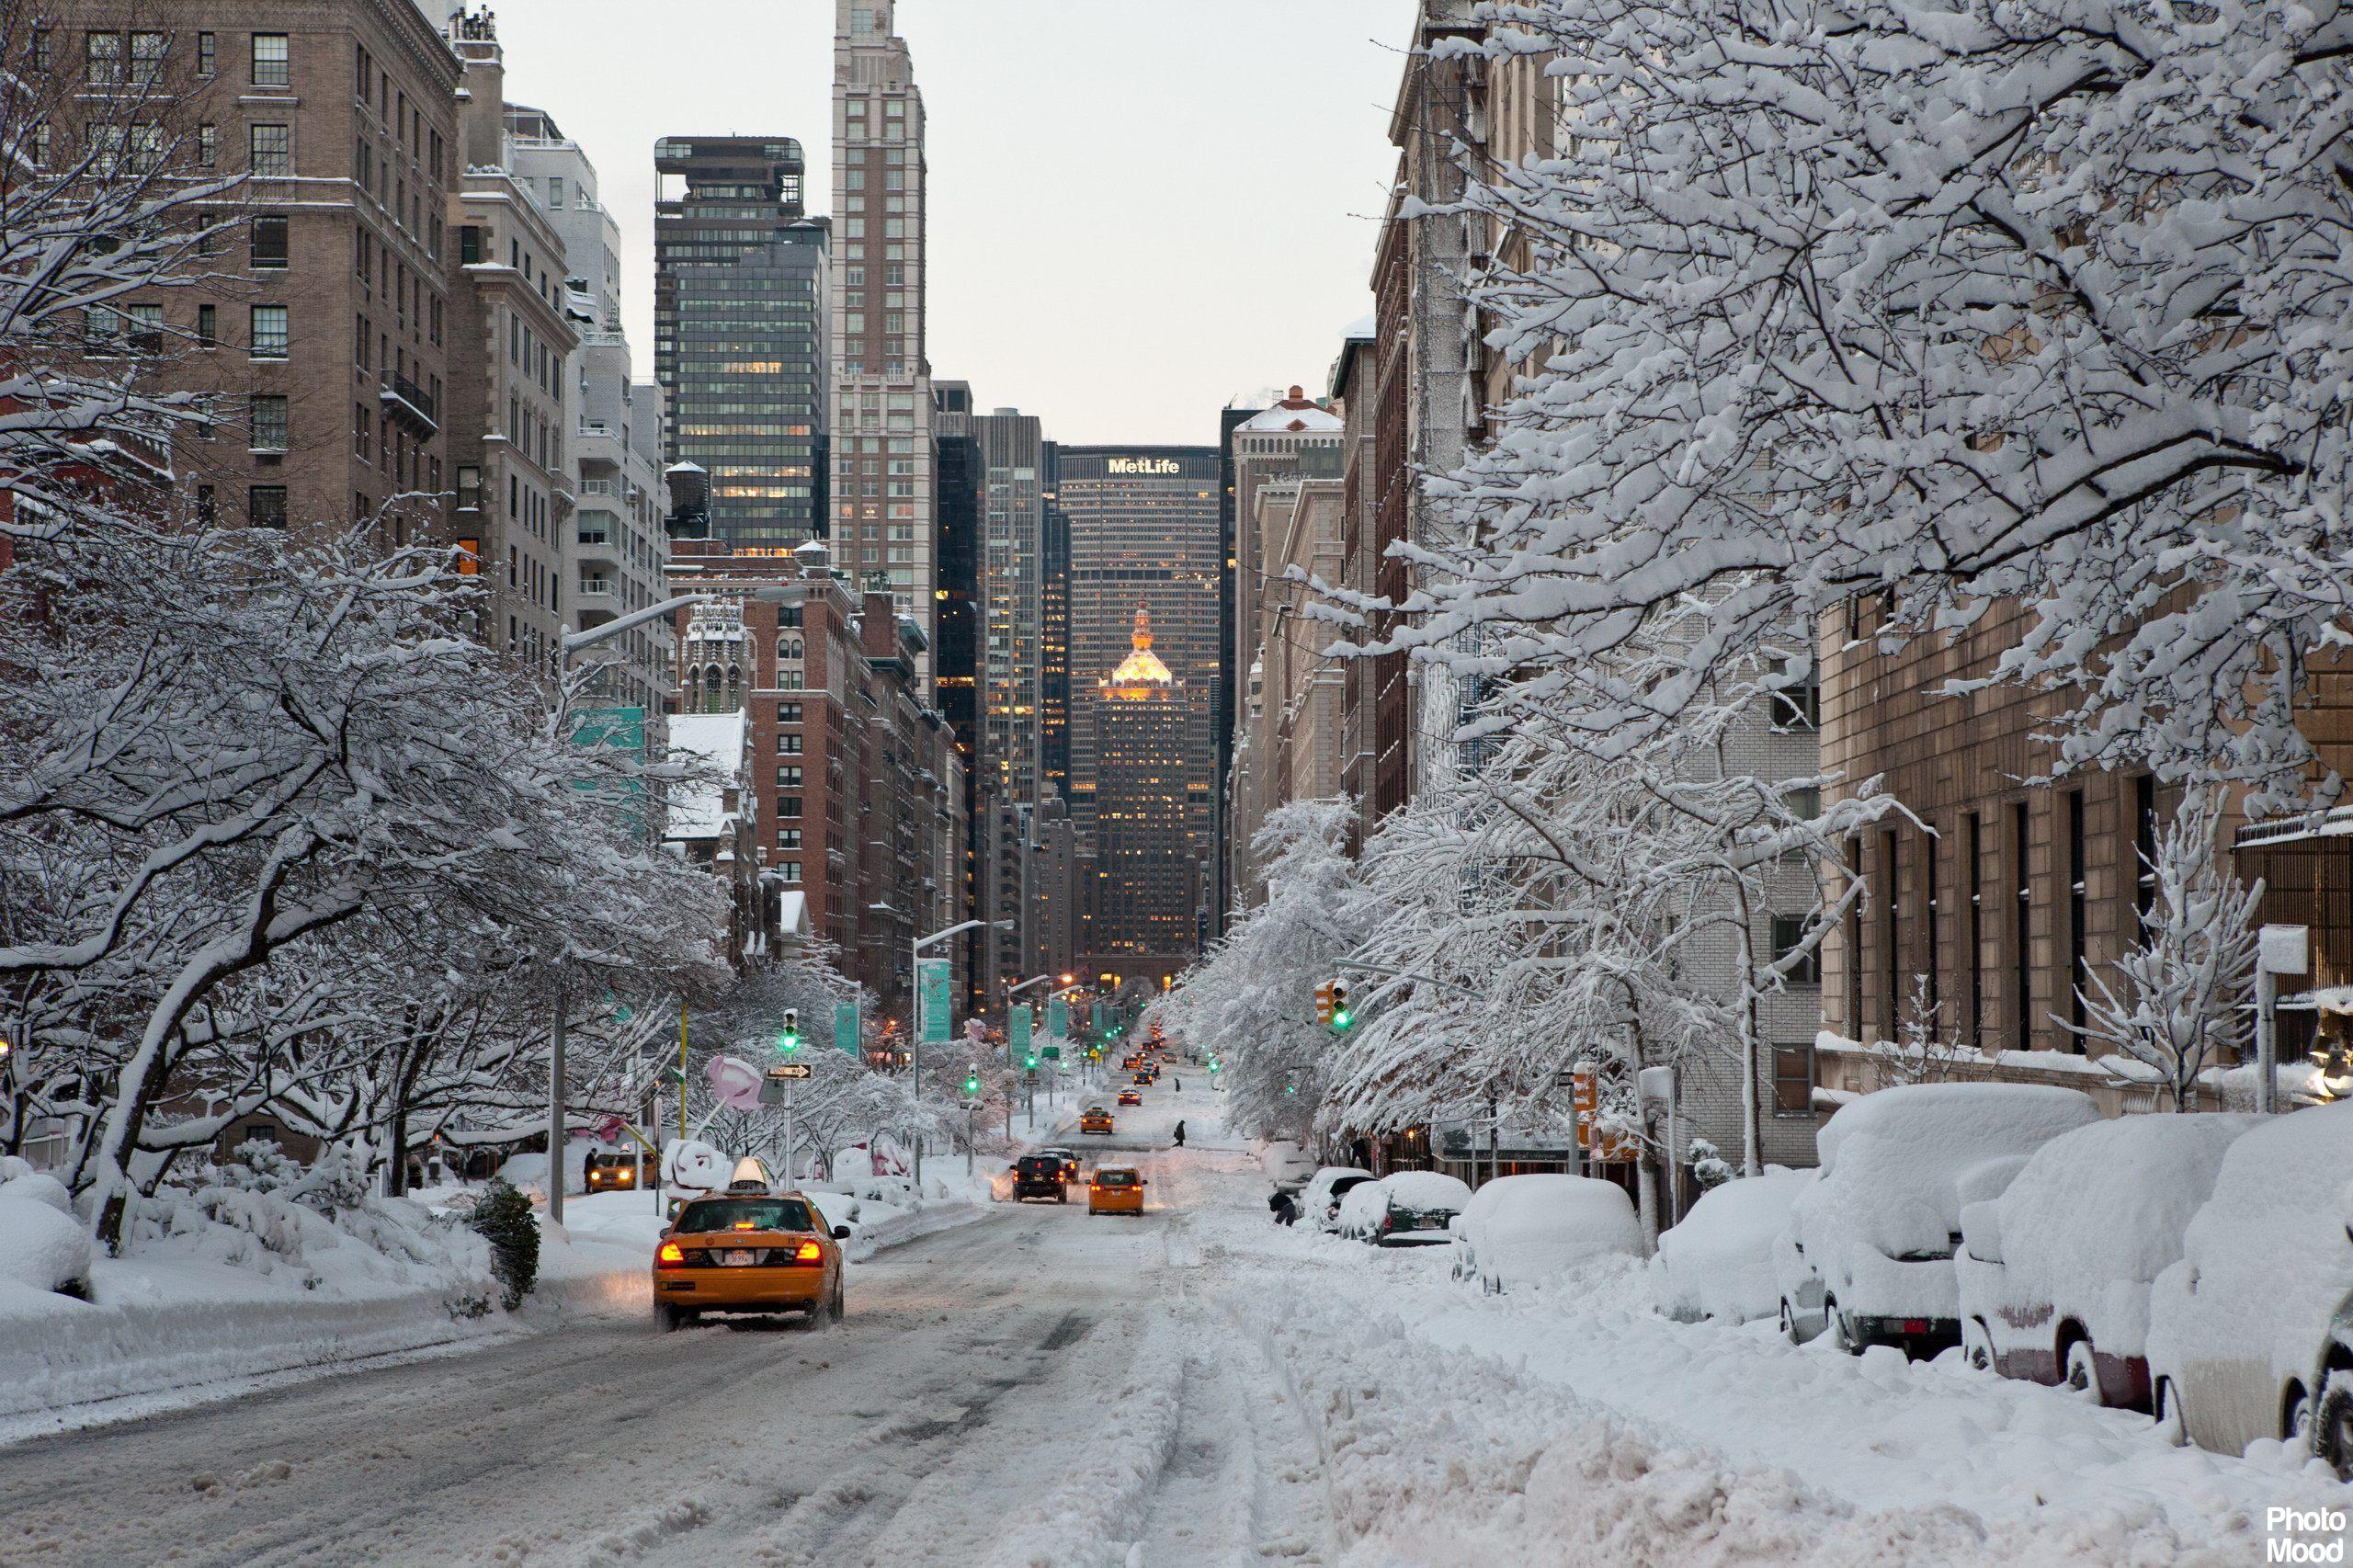 Winter in New York city Photo Mood 2560x1706